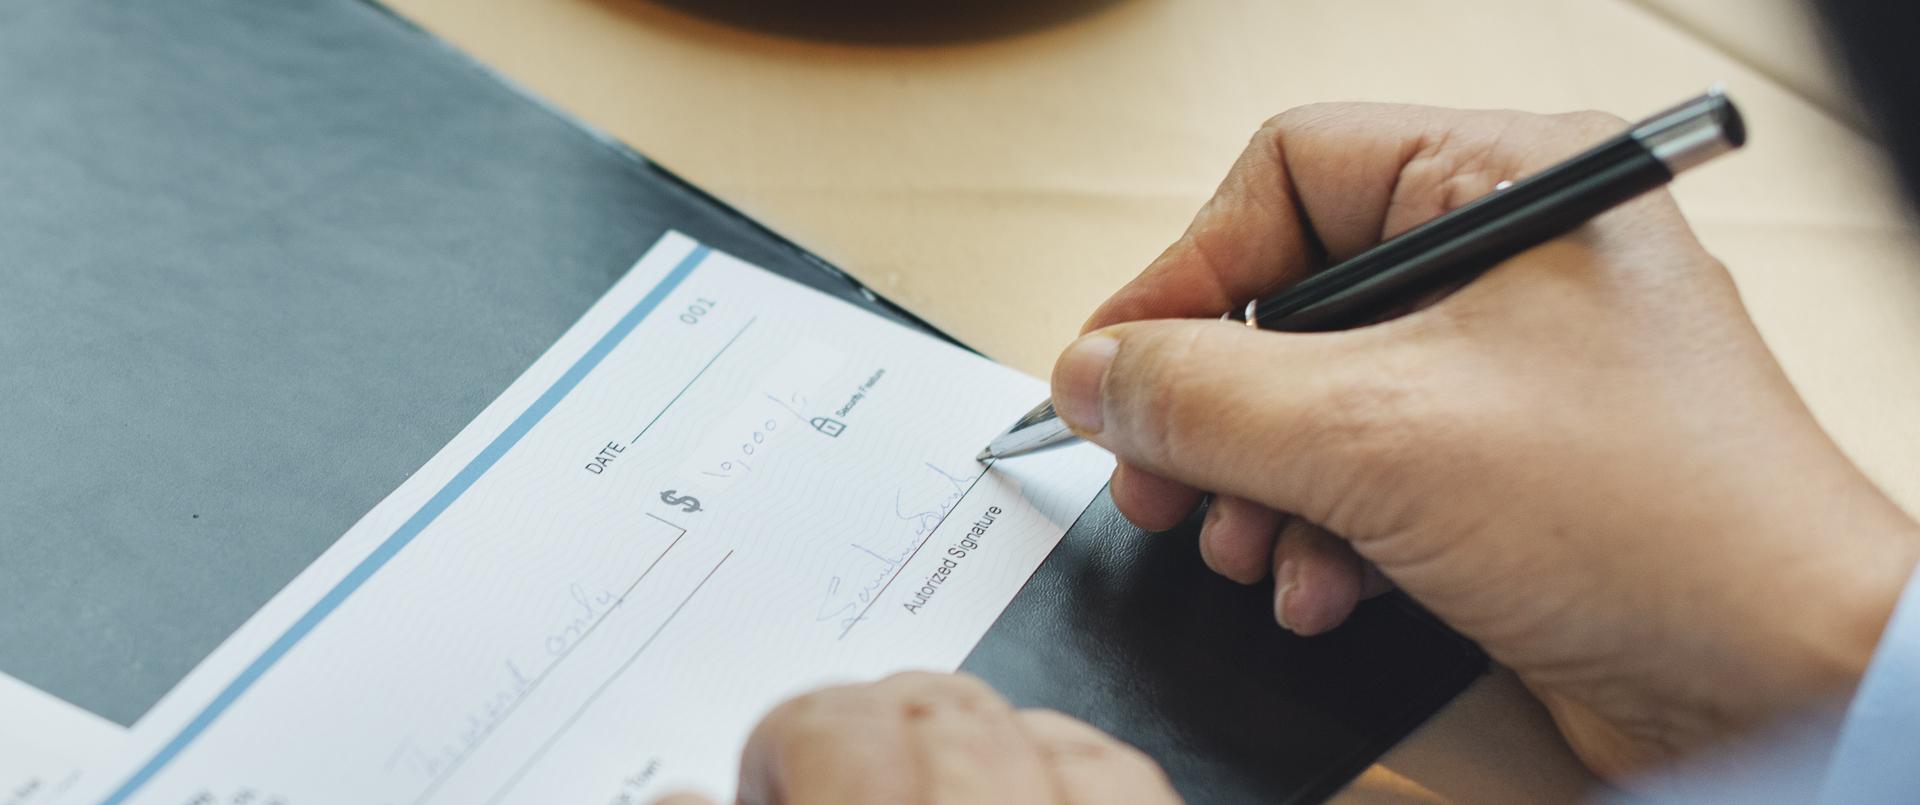 8 Free Checking Accounts With No Minimum Deposit | GOBankingRates